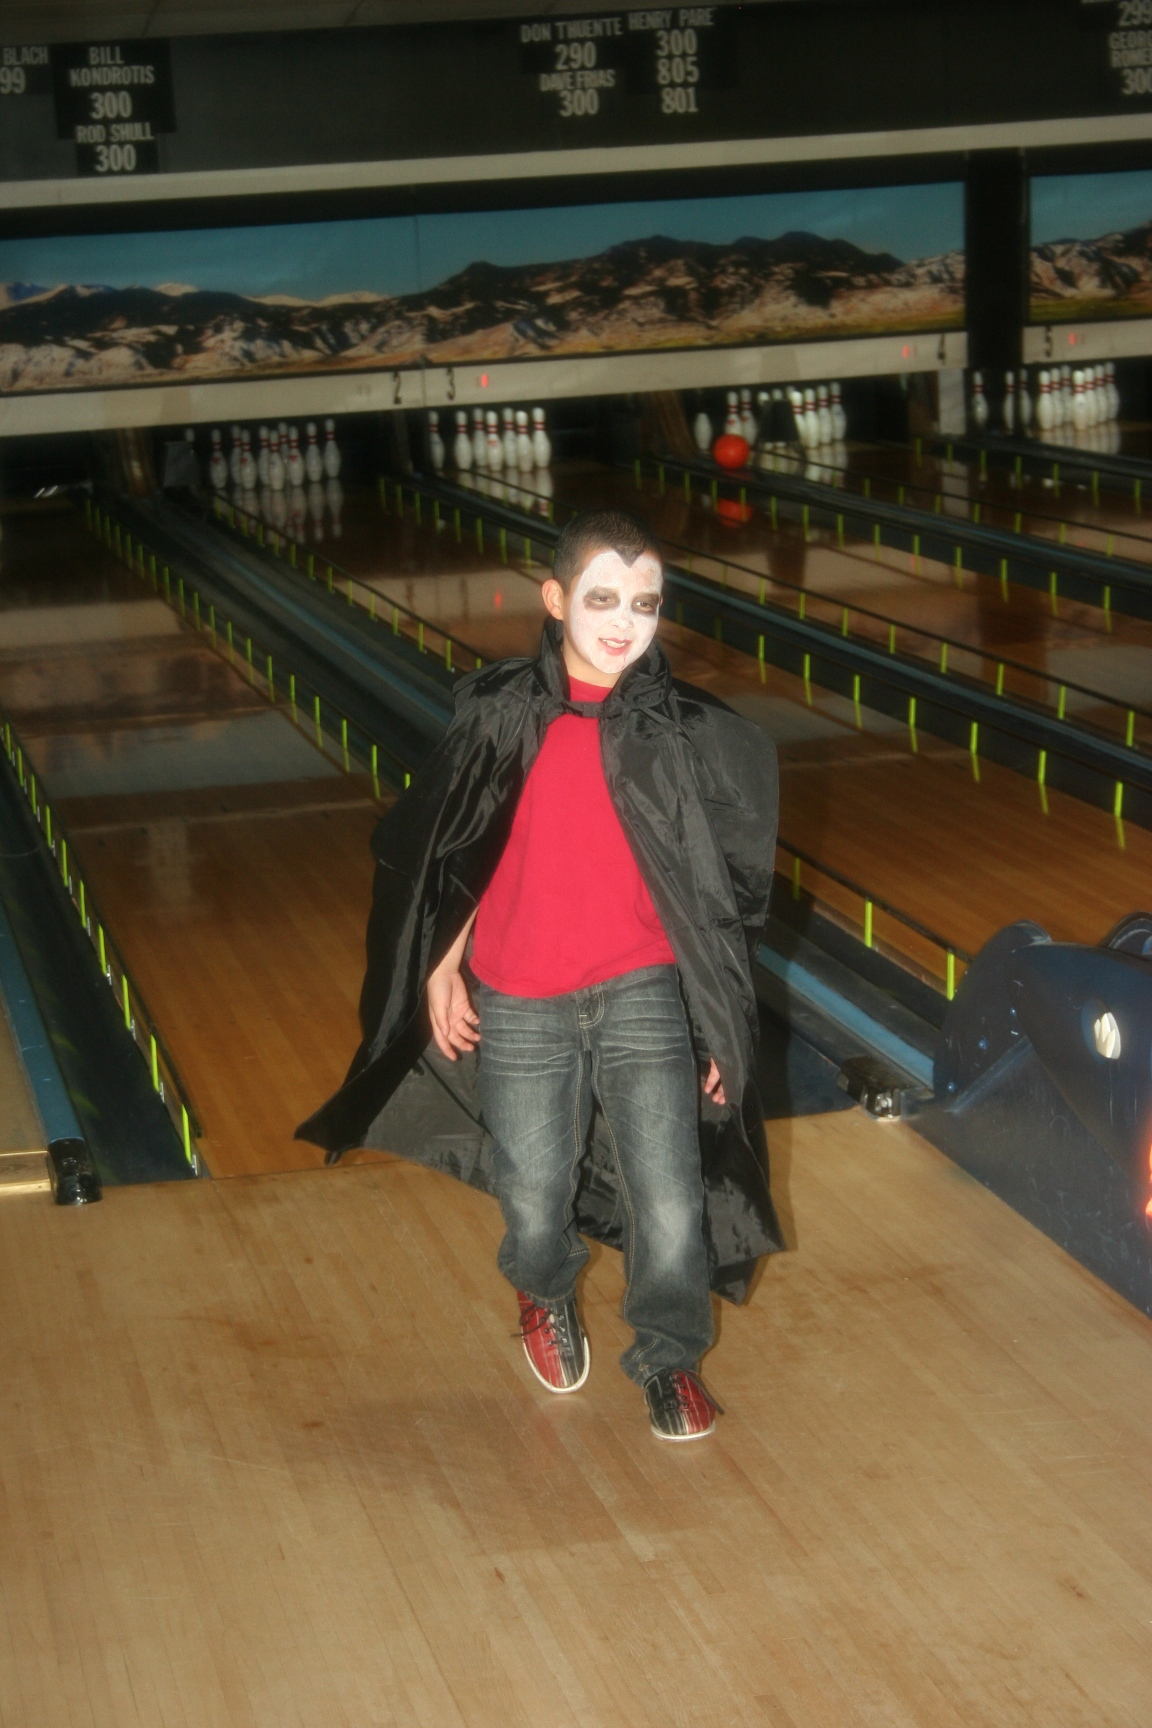 Bowling-2013 - 2013-10-27 15.10.34